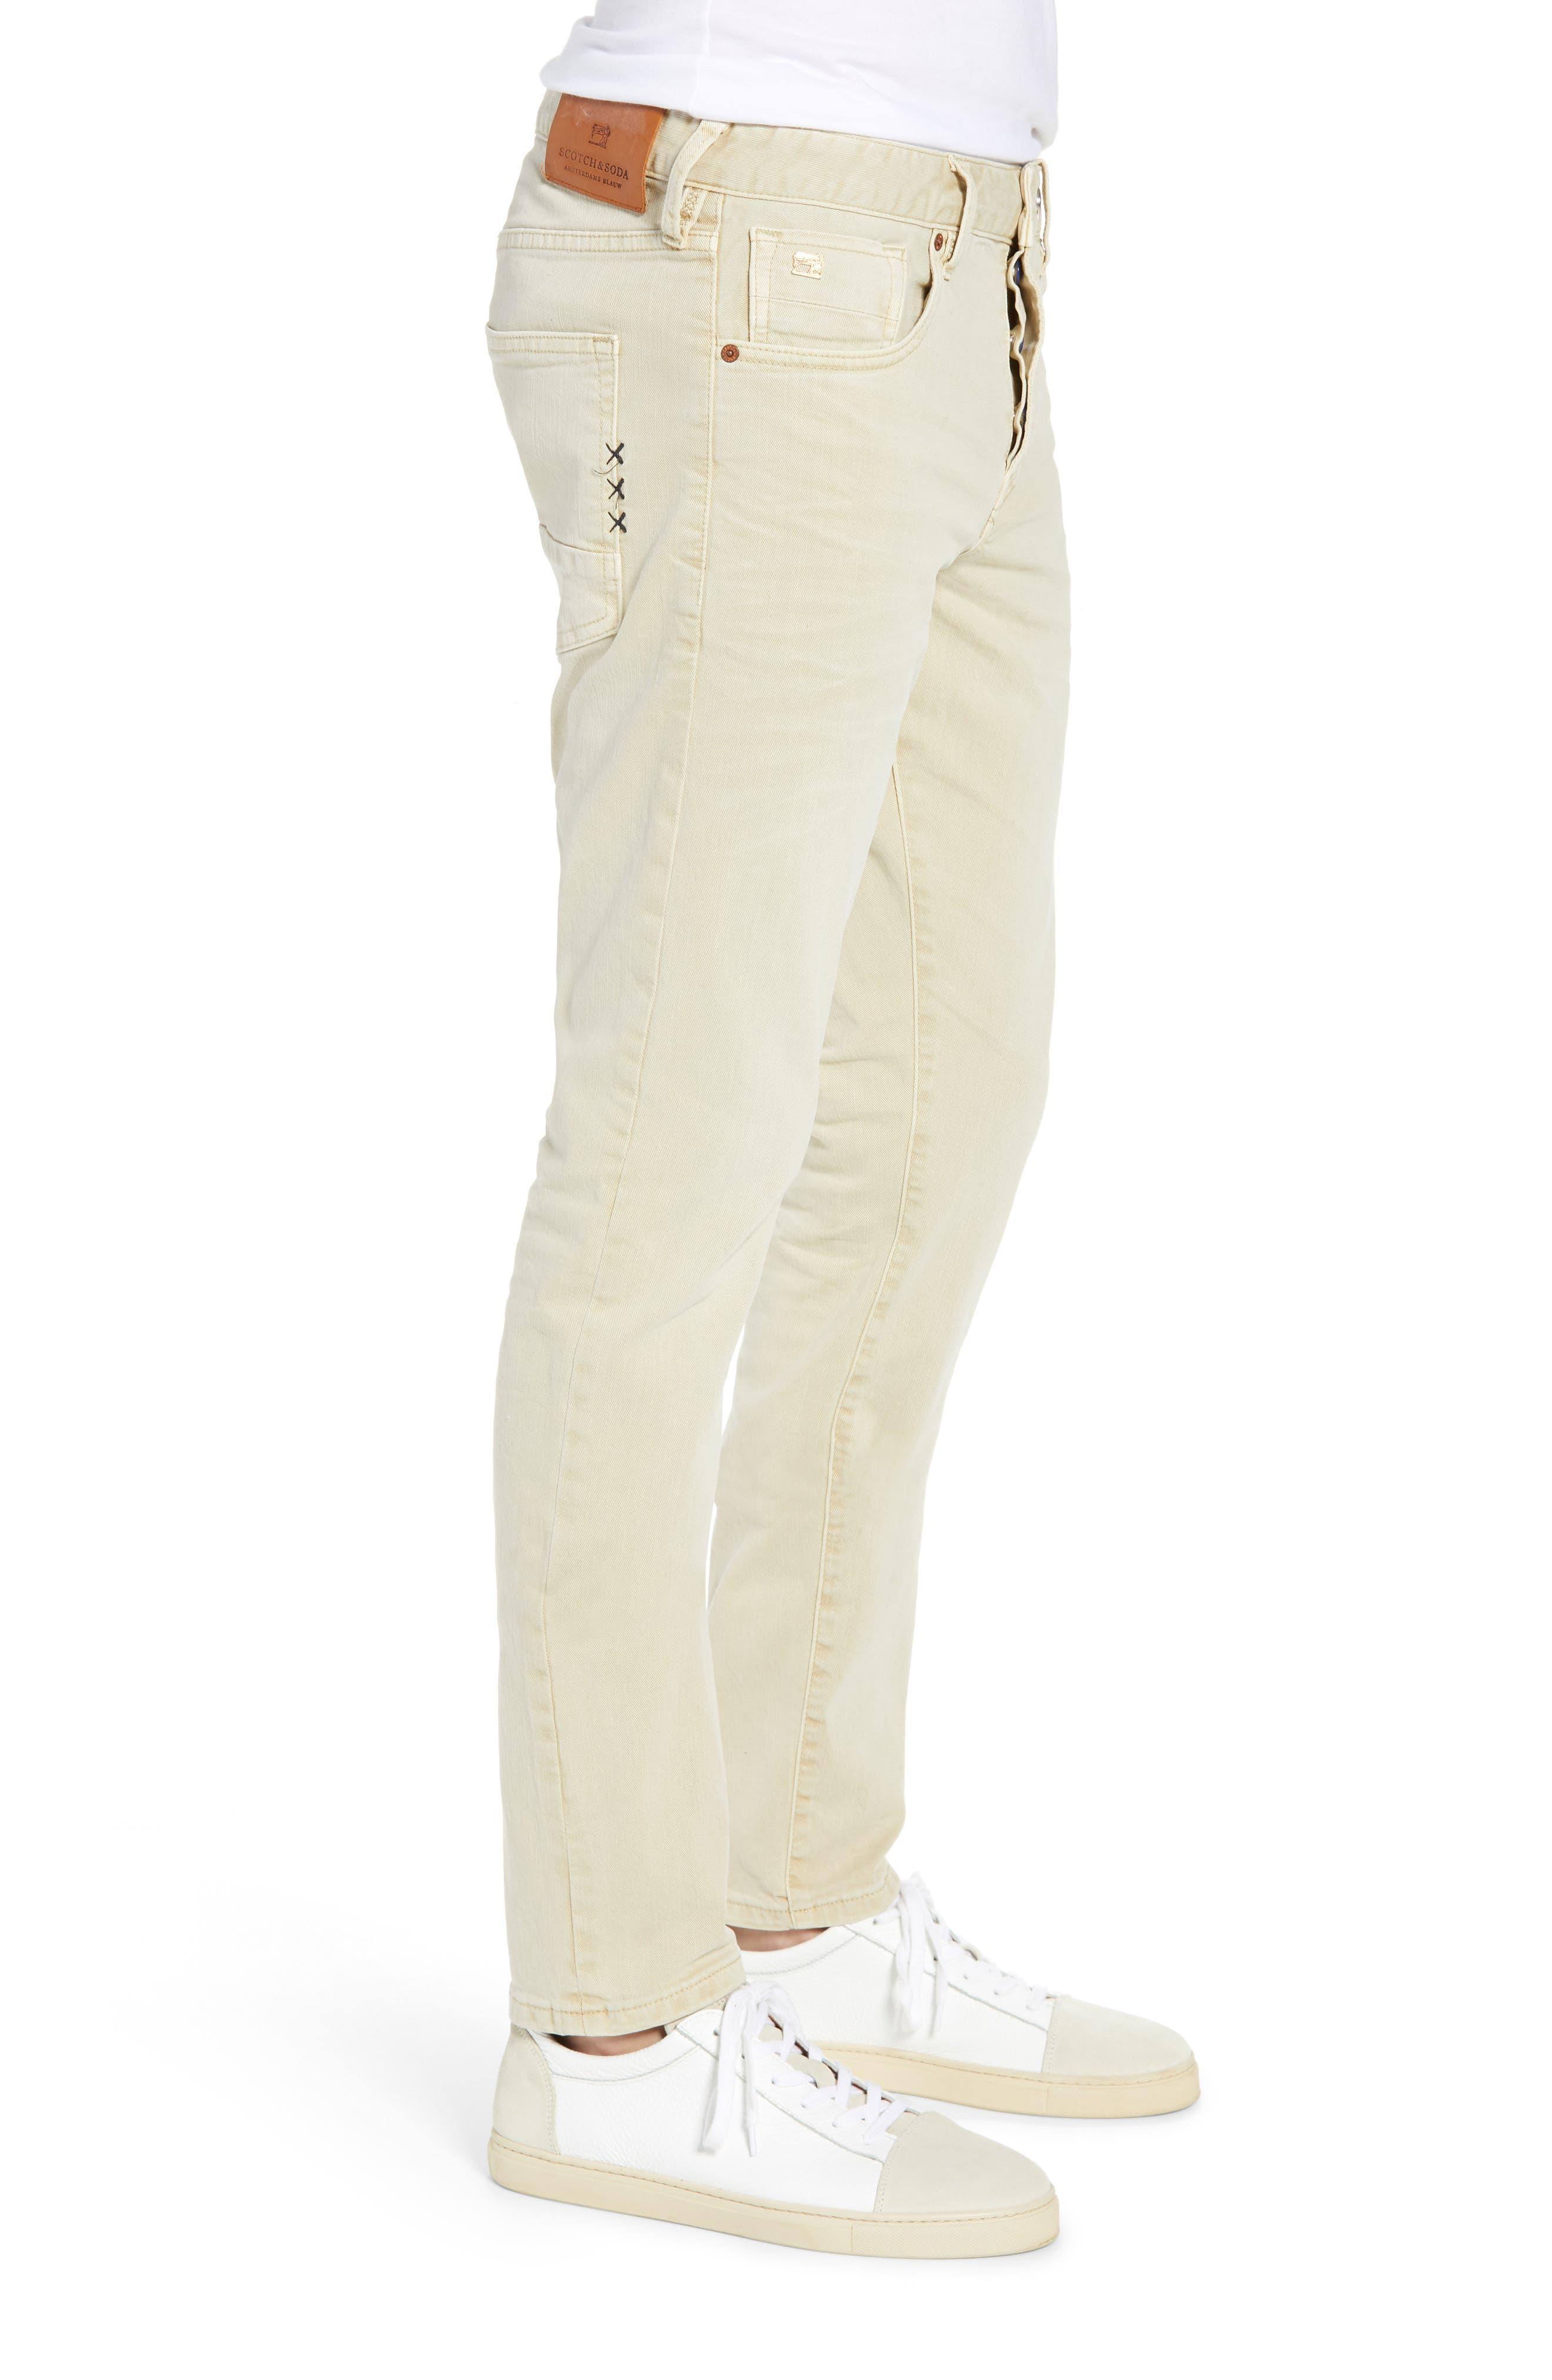 Ralston Slim Fit Pants,                             Alternate thumbnail 3, color,                             SAND